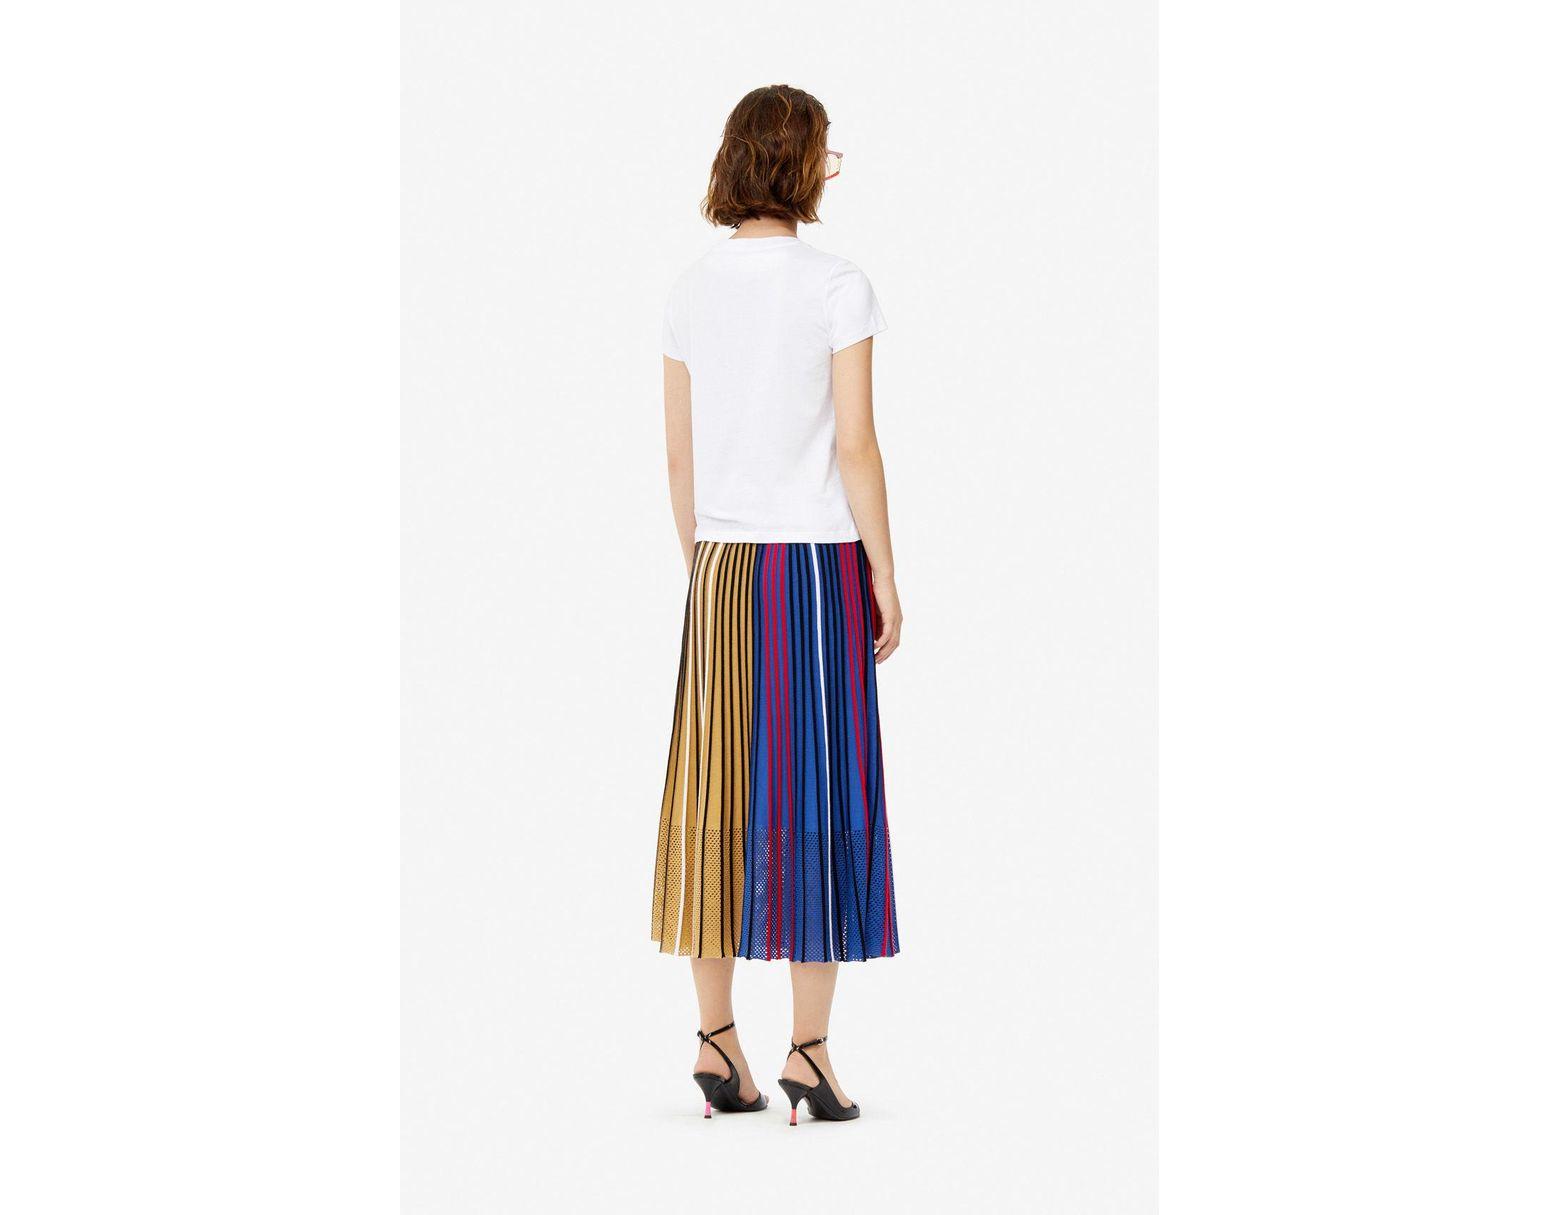 59fcd95591 Women's Pleated Colorblock Knit Skirt